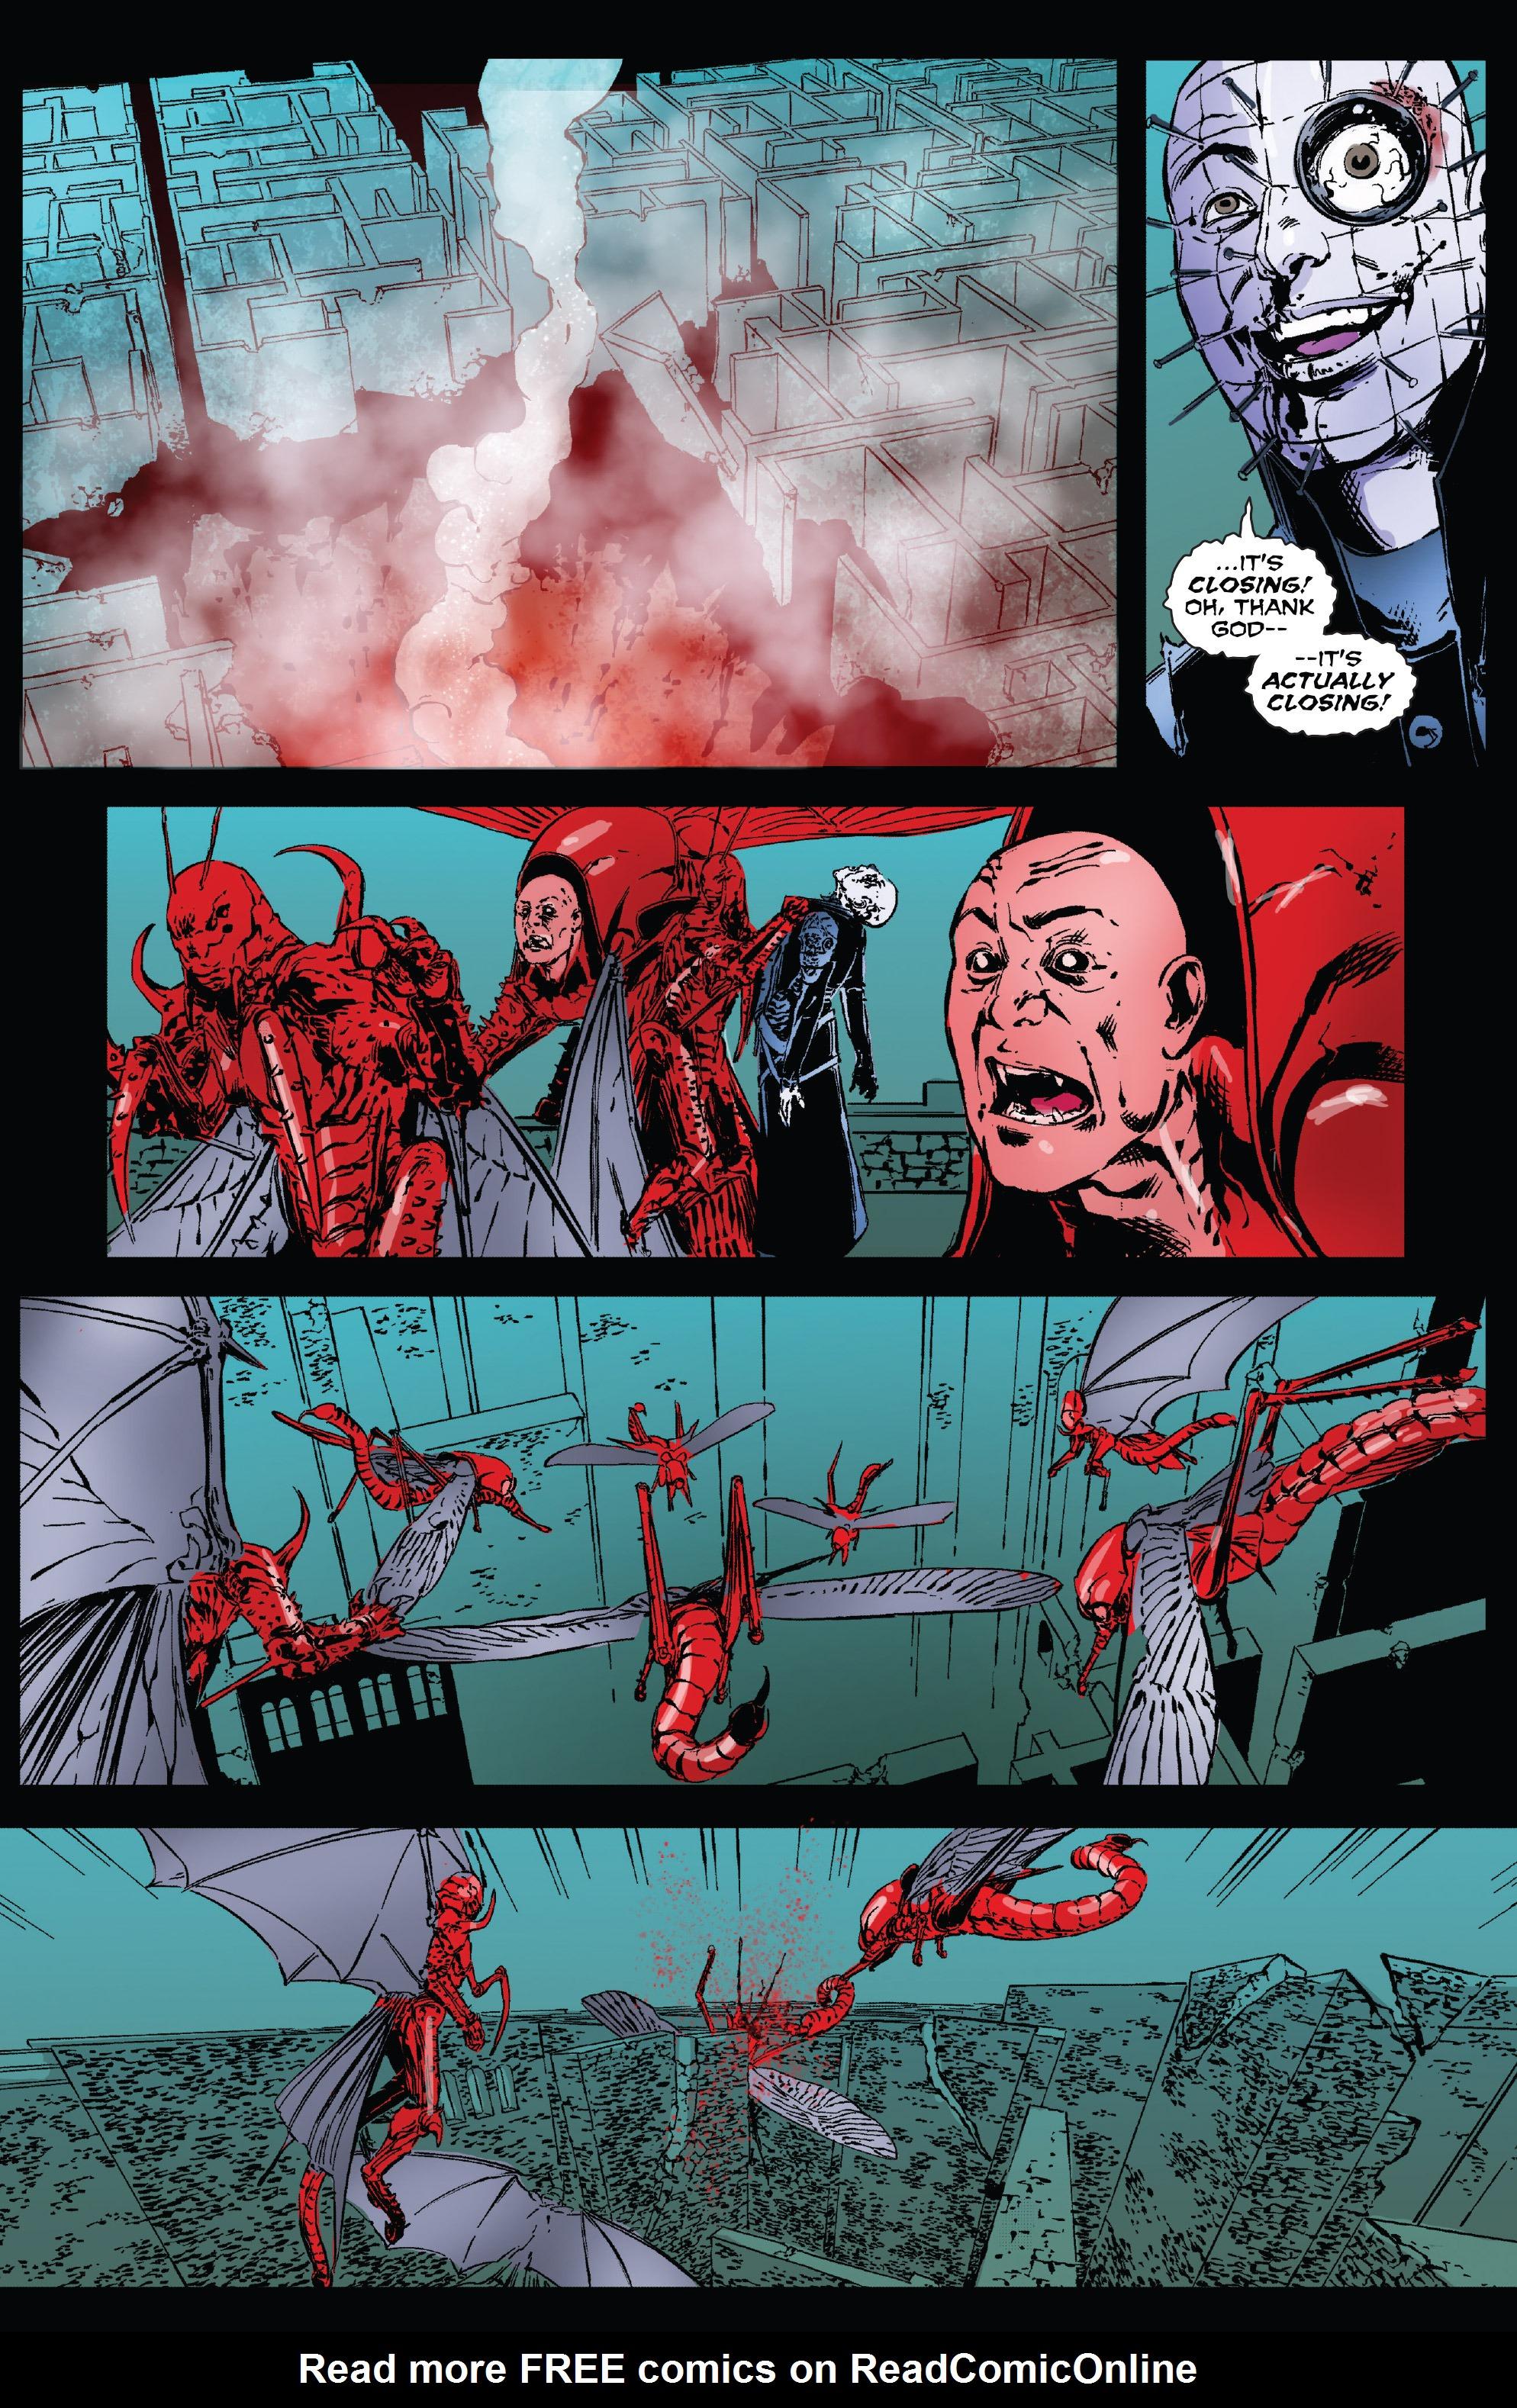 Read online Clive Barker's Hellraiser: The Dark Watch comic -  Issue # TPB 3 - 123